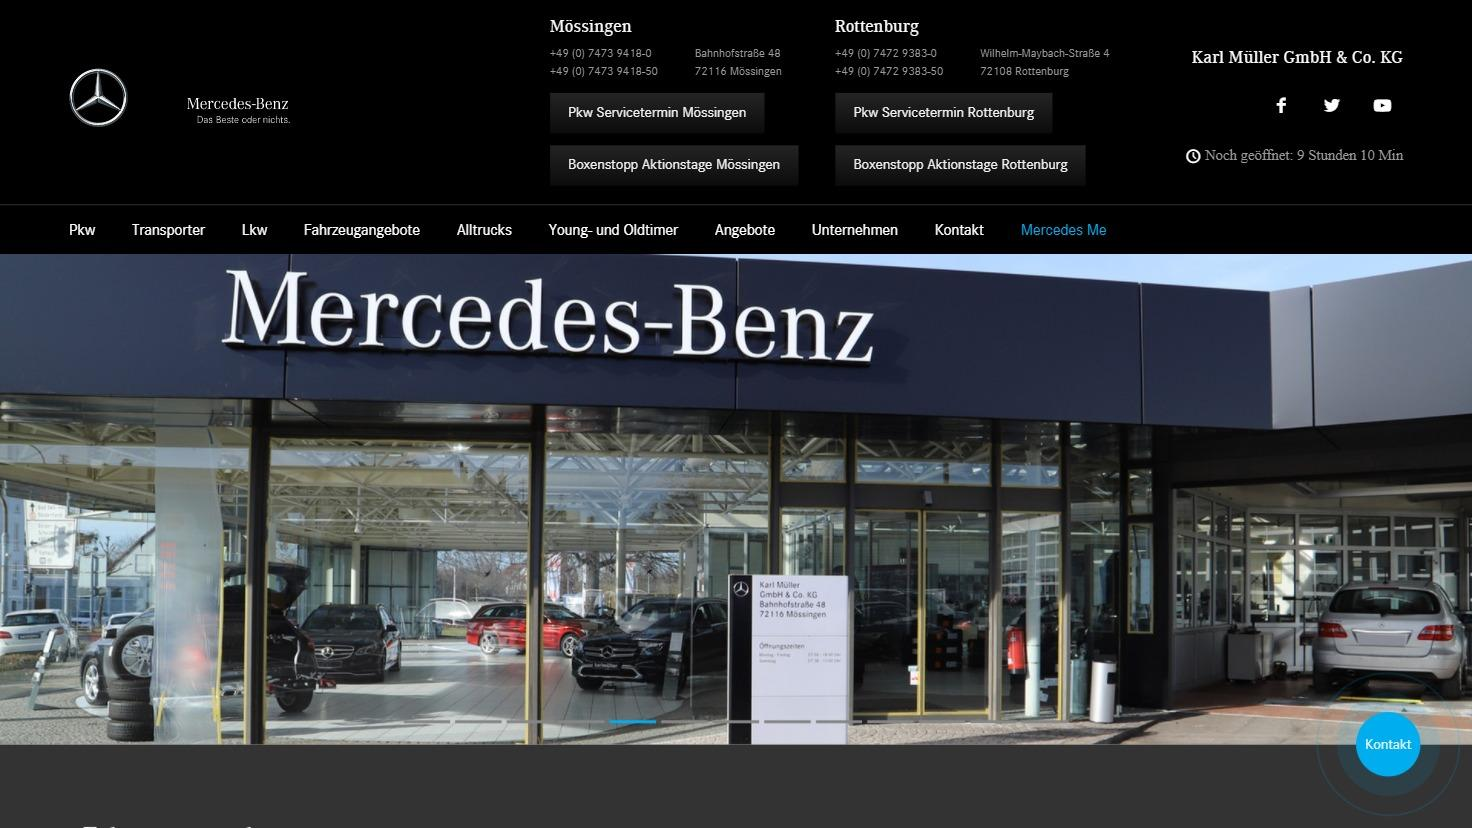 Karl Müller - Mercedes-Benz